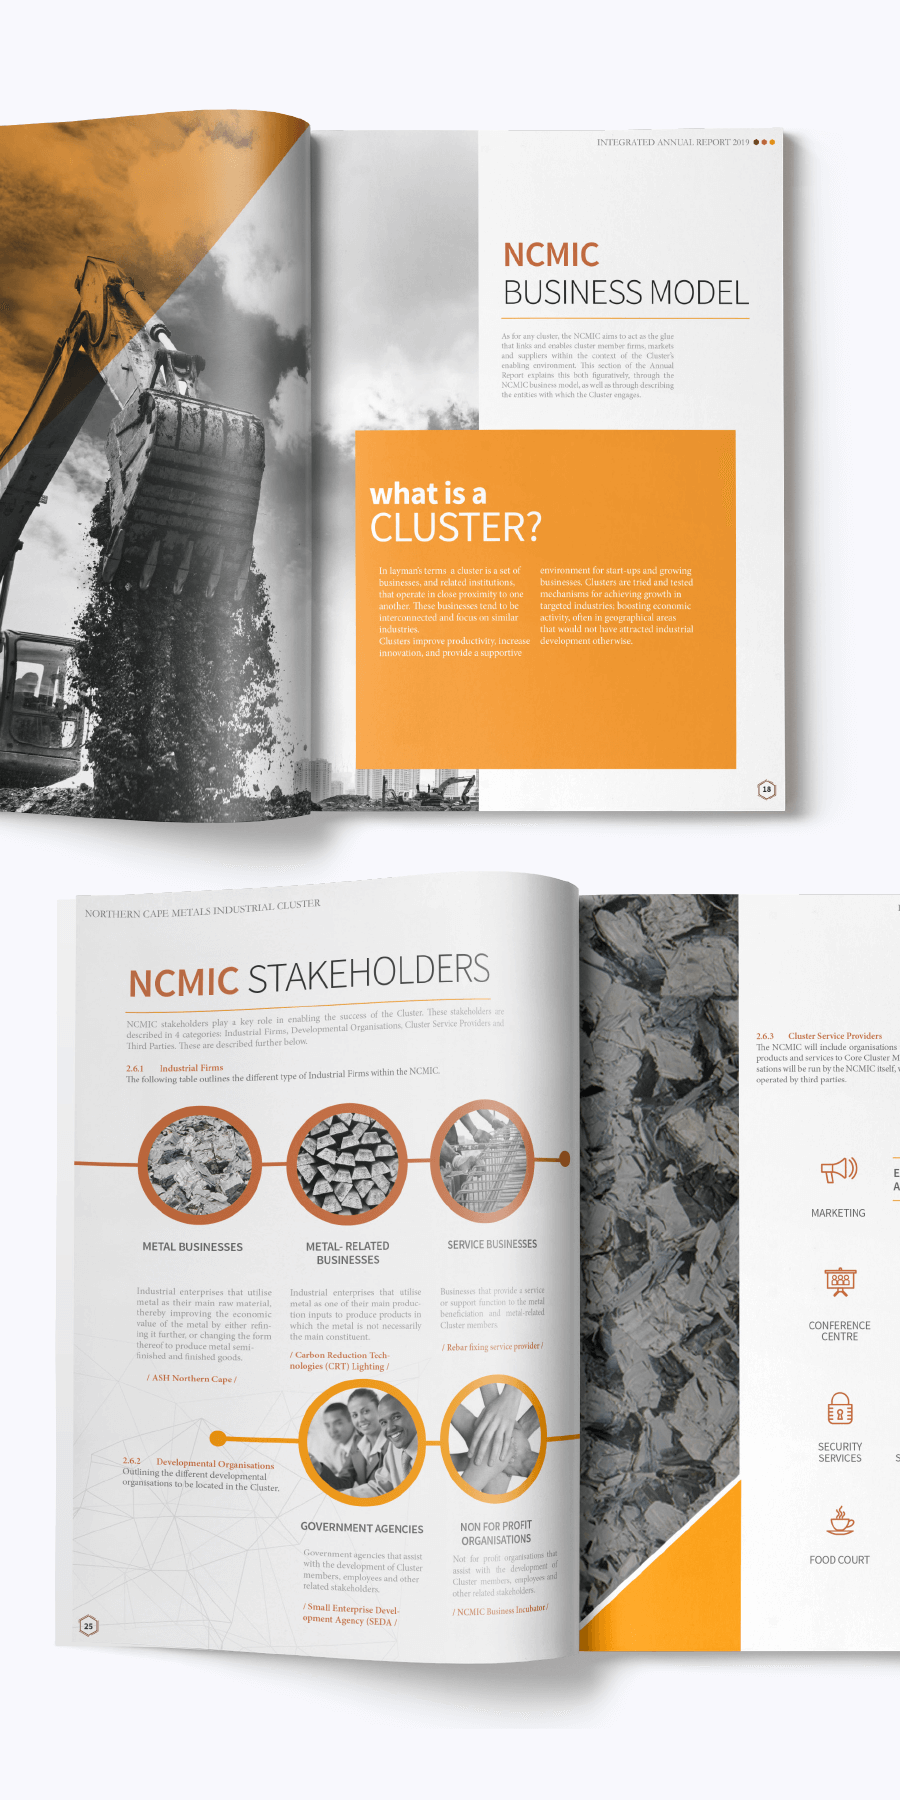 gazzaroo website design branding socialmediamanagement ncmic annual report - Branding & Graphic Design